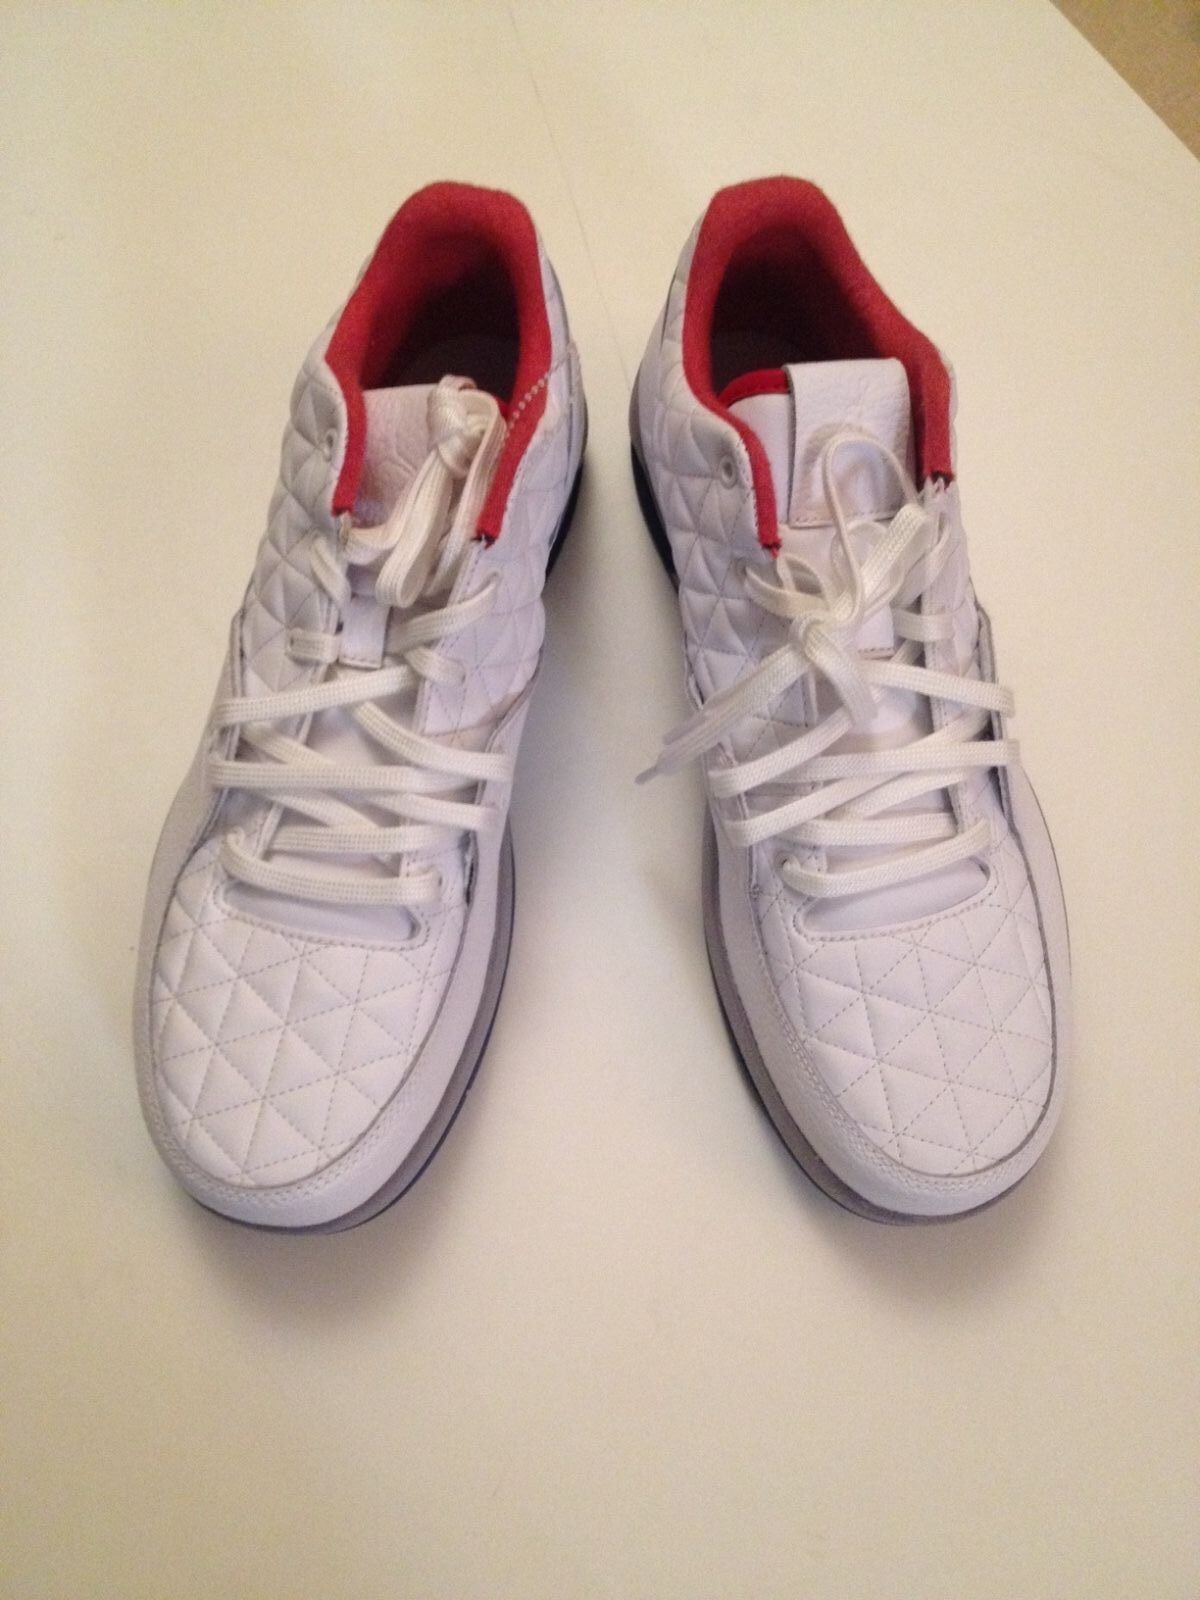 New    White Air Jordans Size 10.5